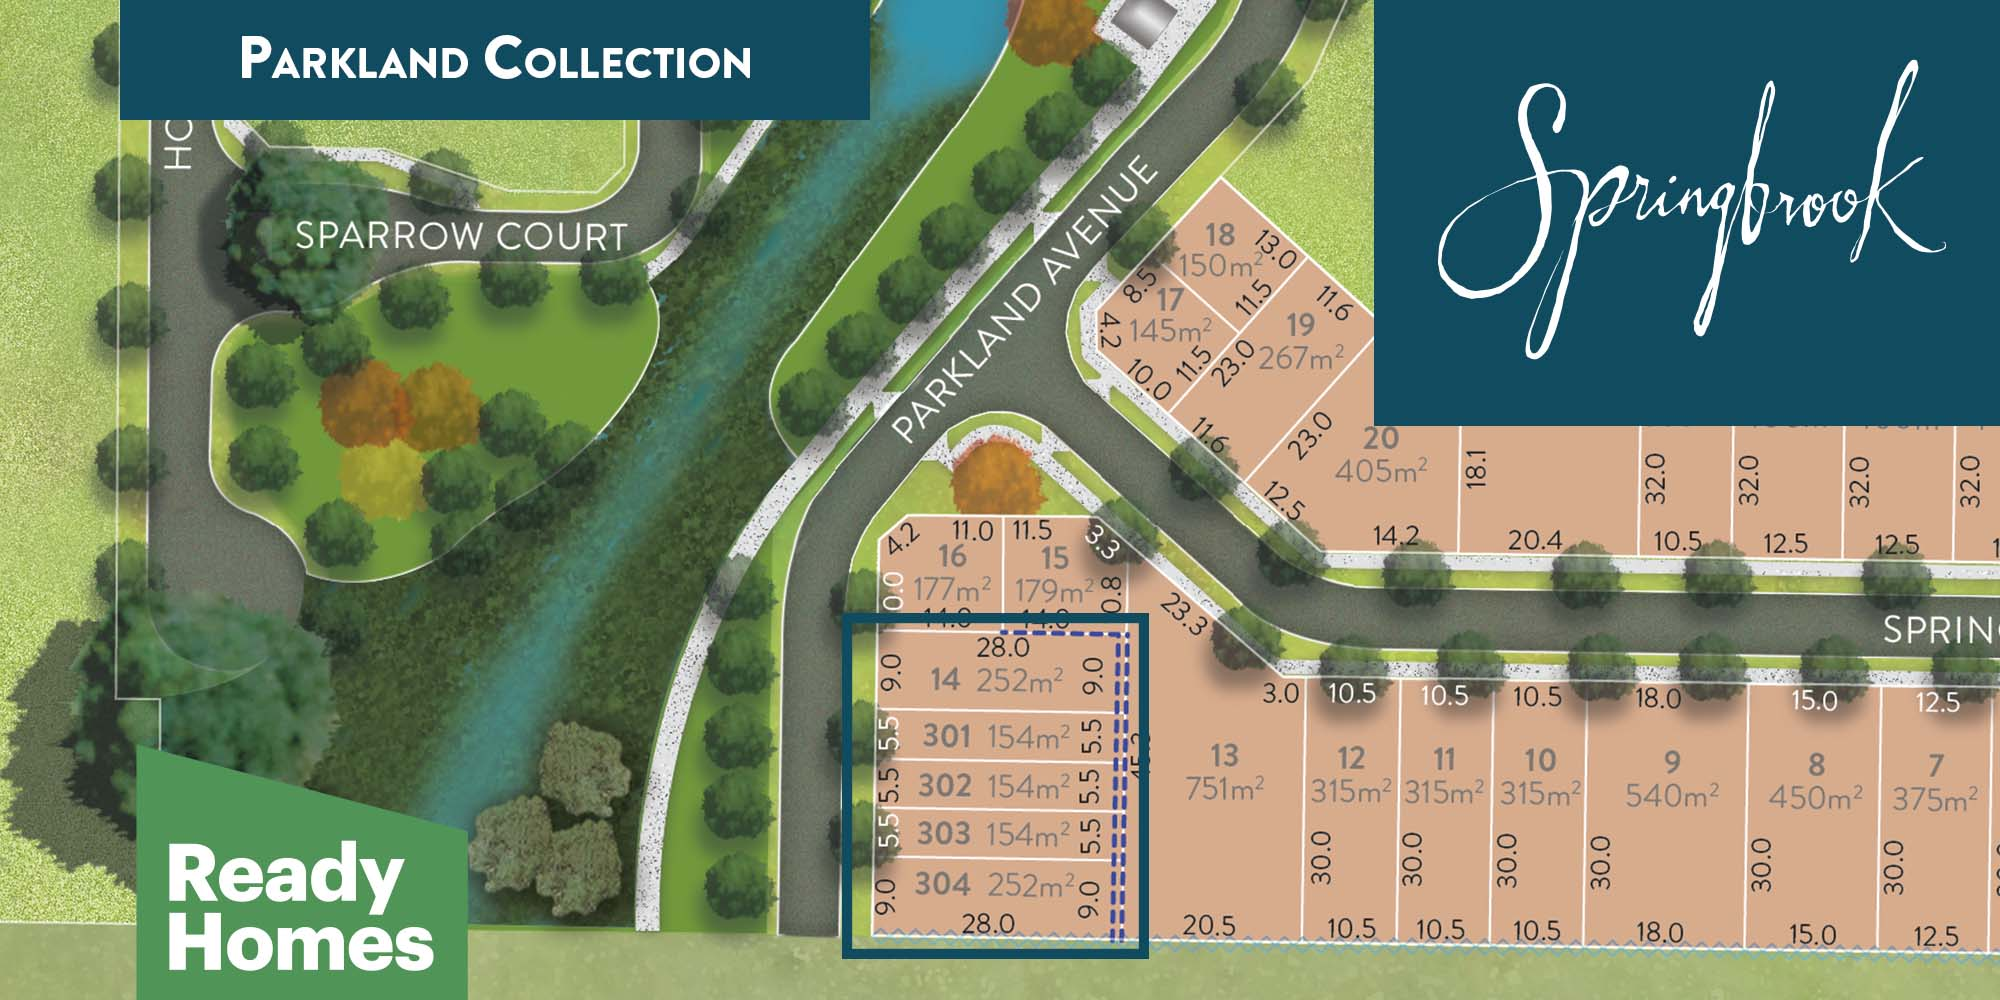 Parkland Collection location